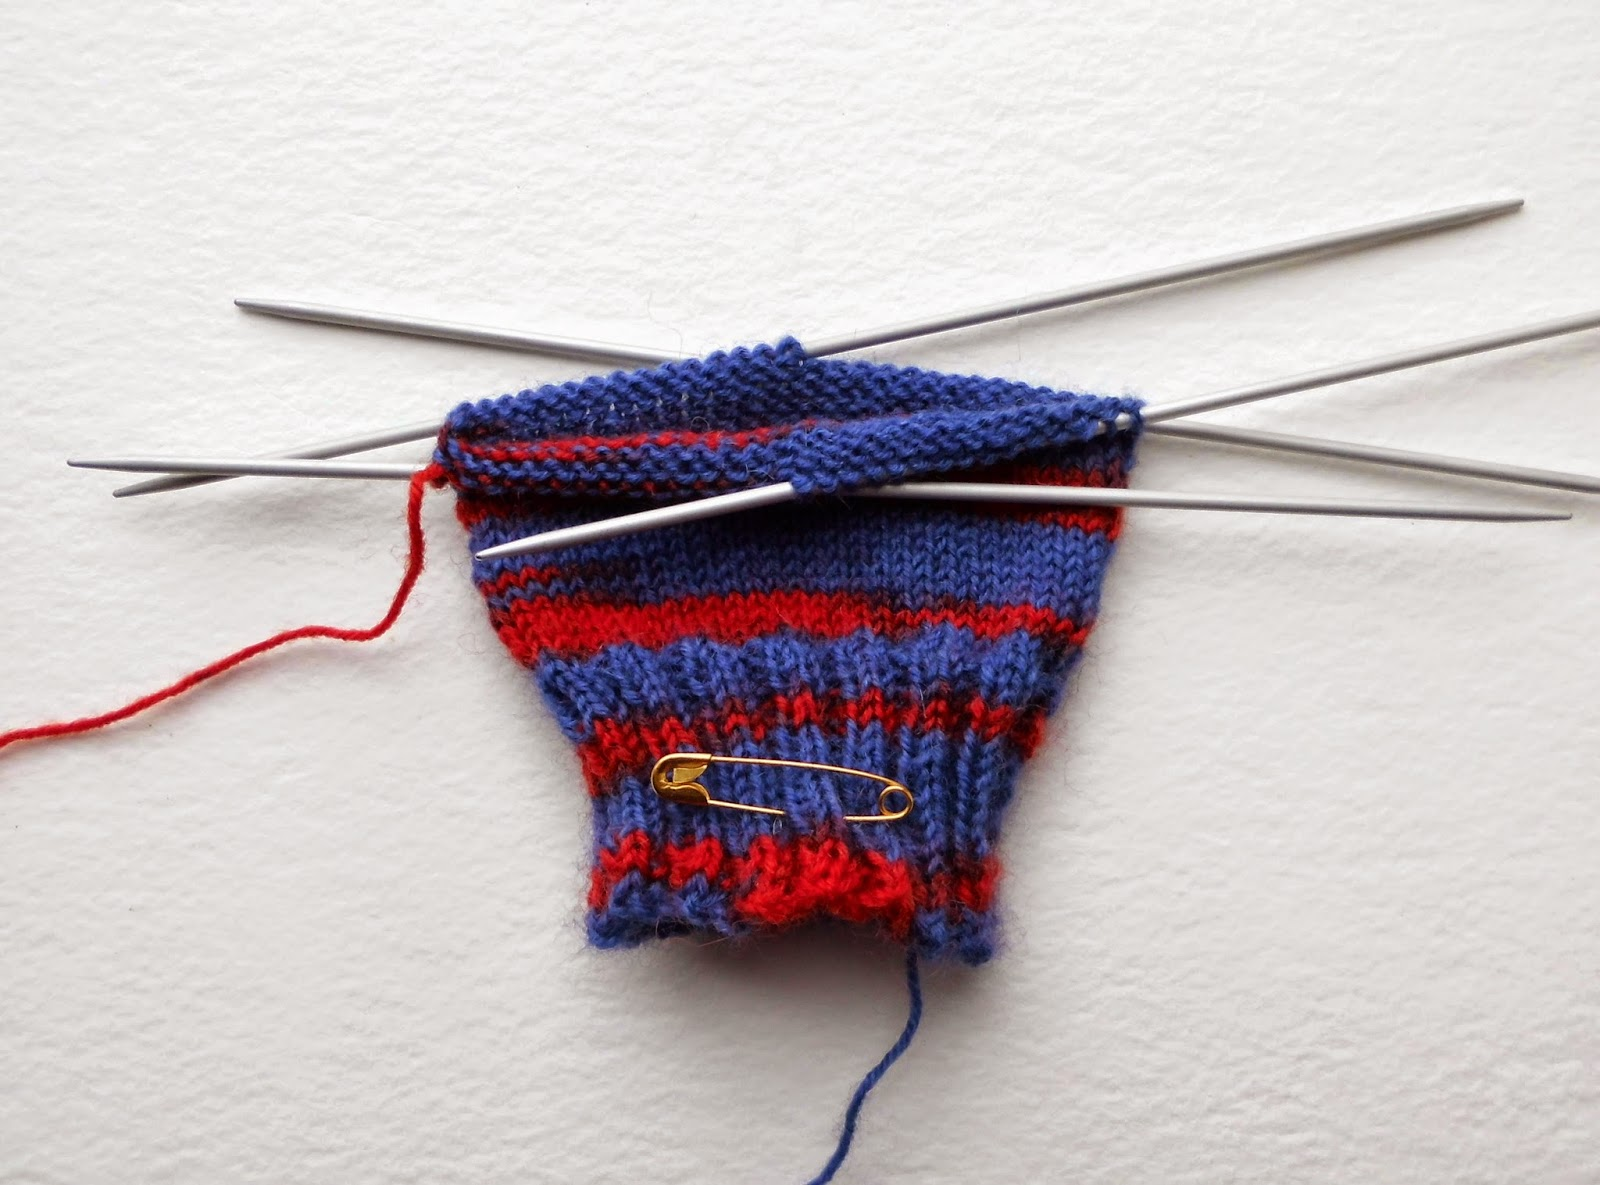 Knitting On Circular Needles With Few Stitches : Winwick Mum: Beginner sock knitting: Sockalong - needles